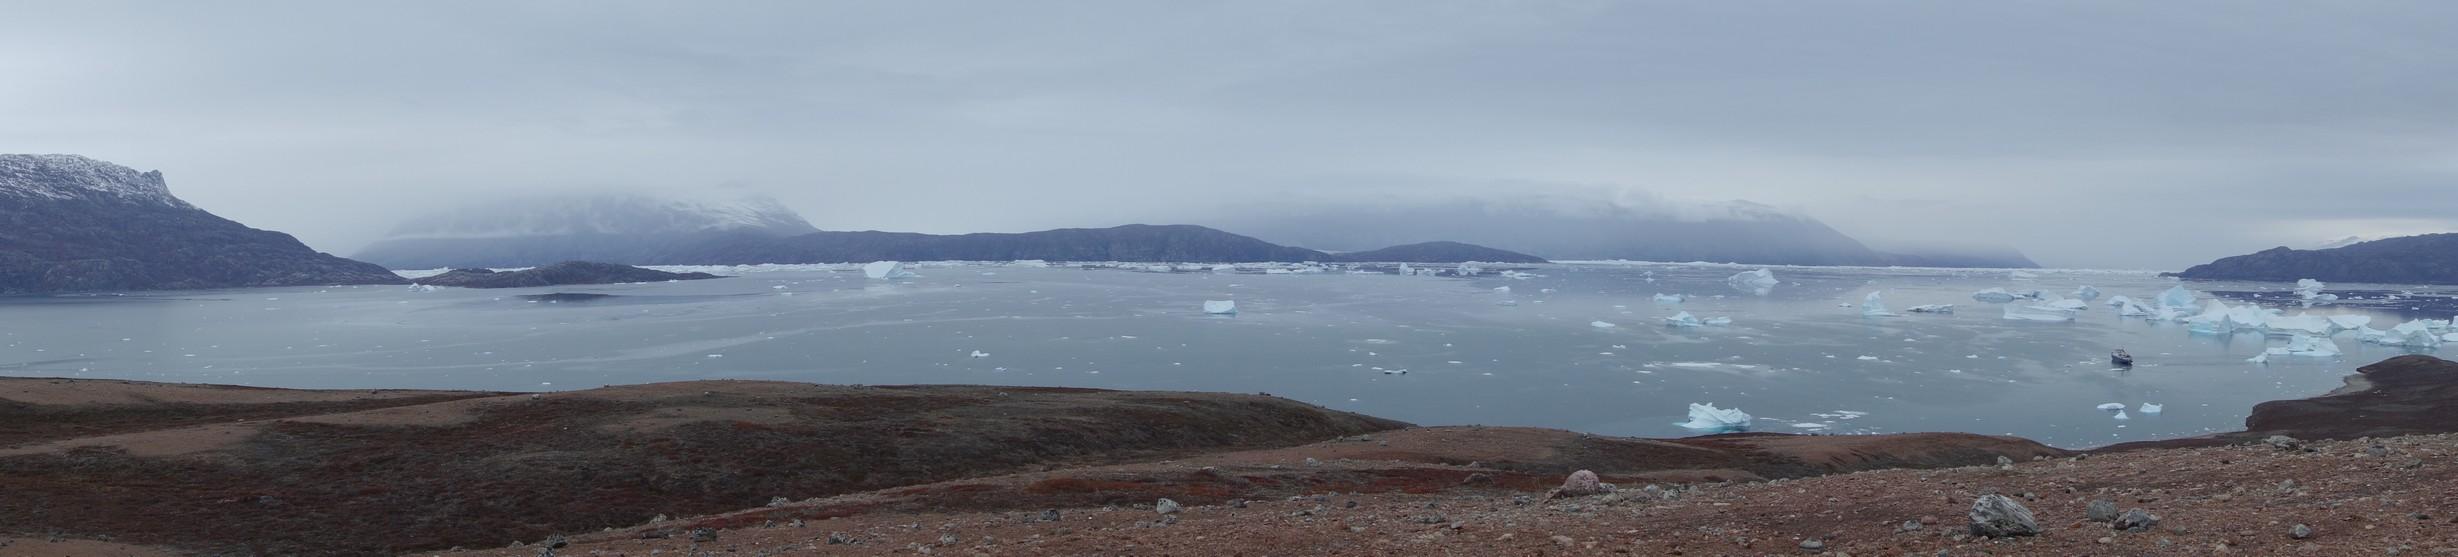 Groenland 2015 Scoresbysund (4)